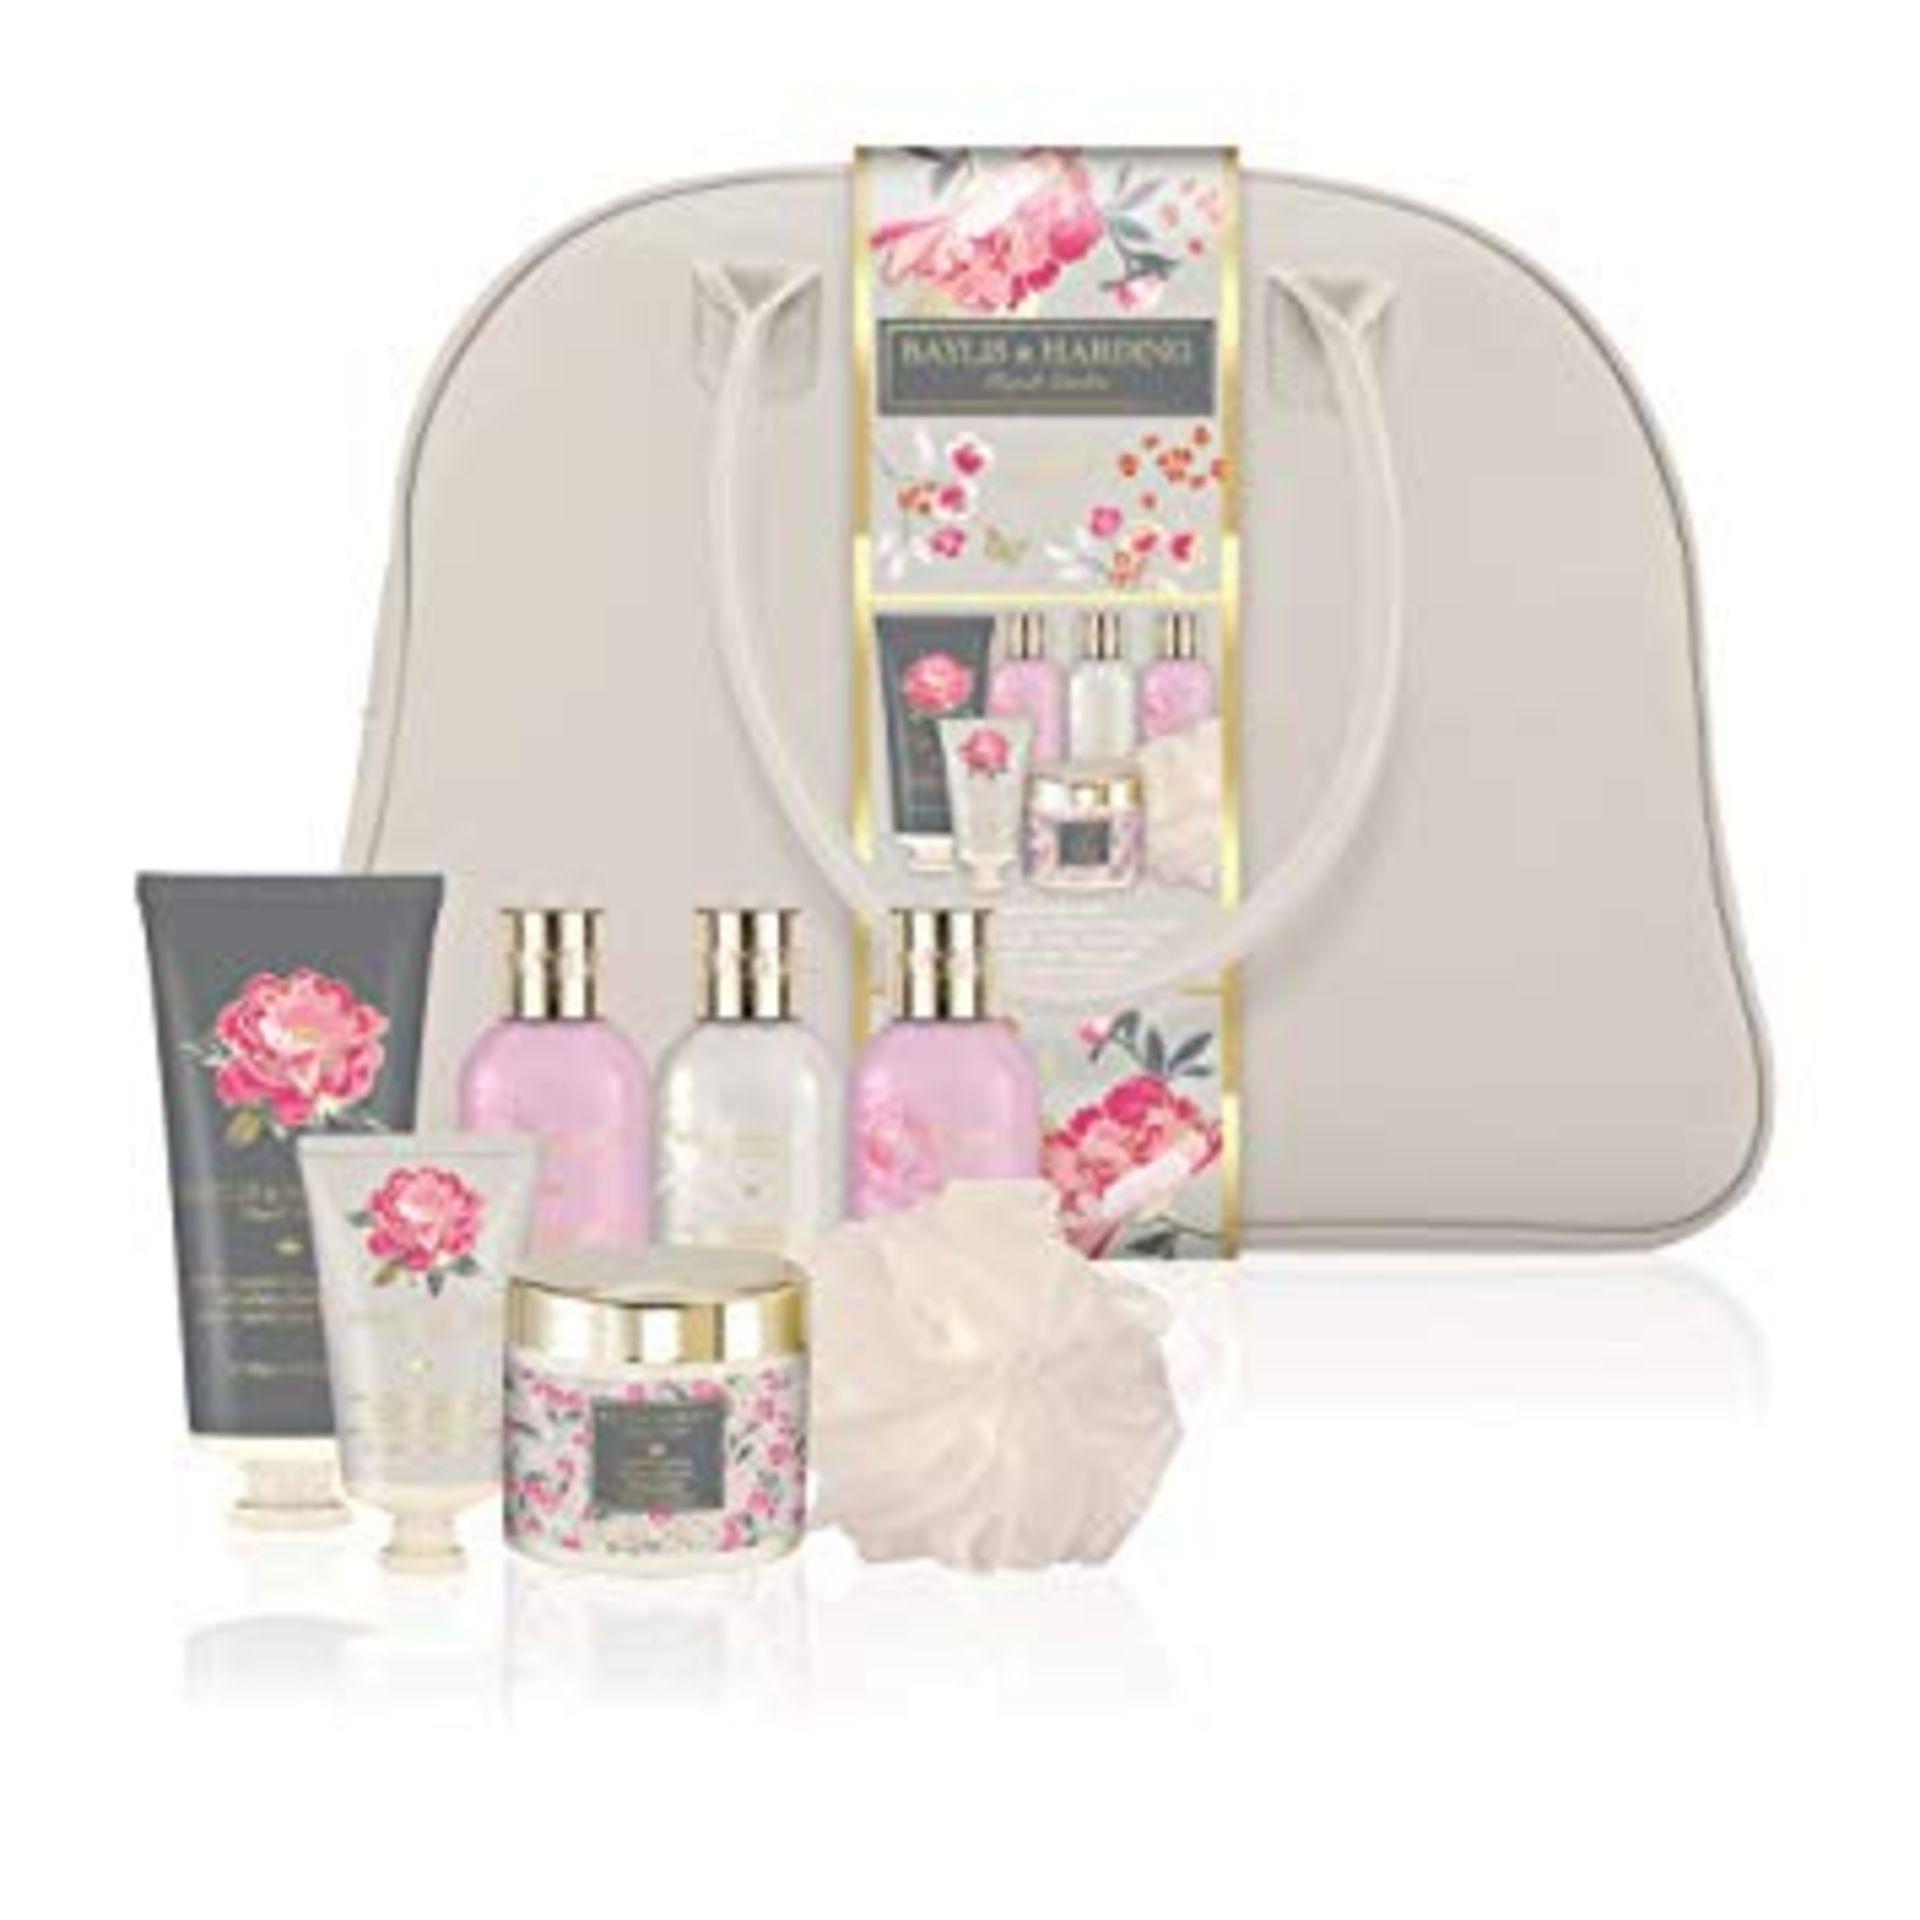 Lot 18187 - V Brand New Baylis & Harding Pink Magnolia & Pear Blossom Weekend Bag Inc 200ml Body Wash + 100ml